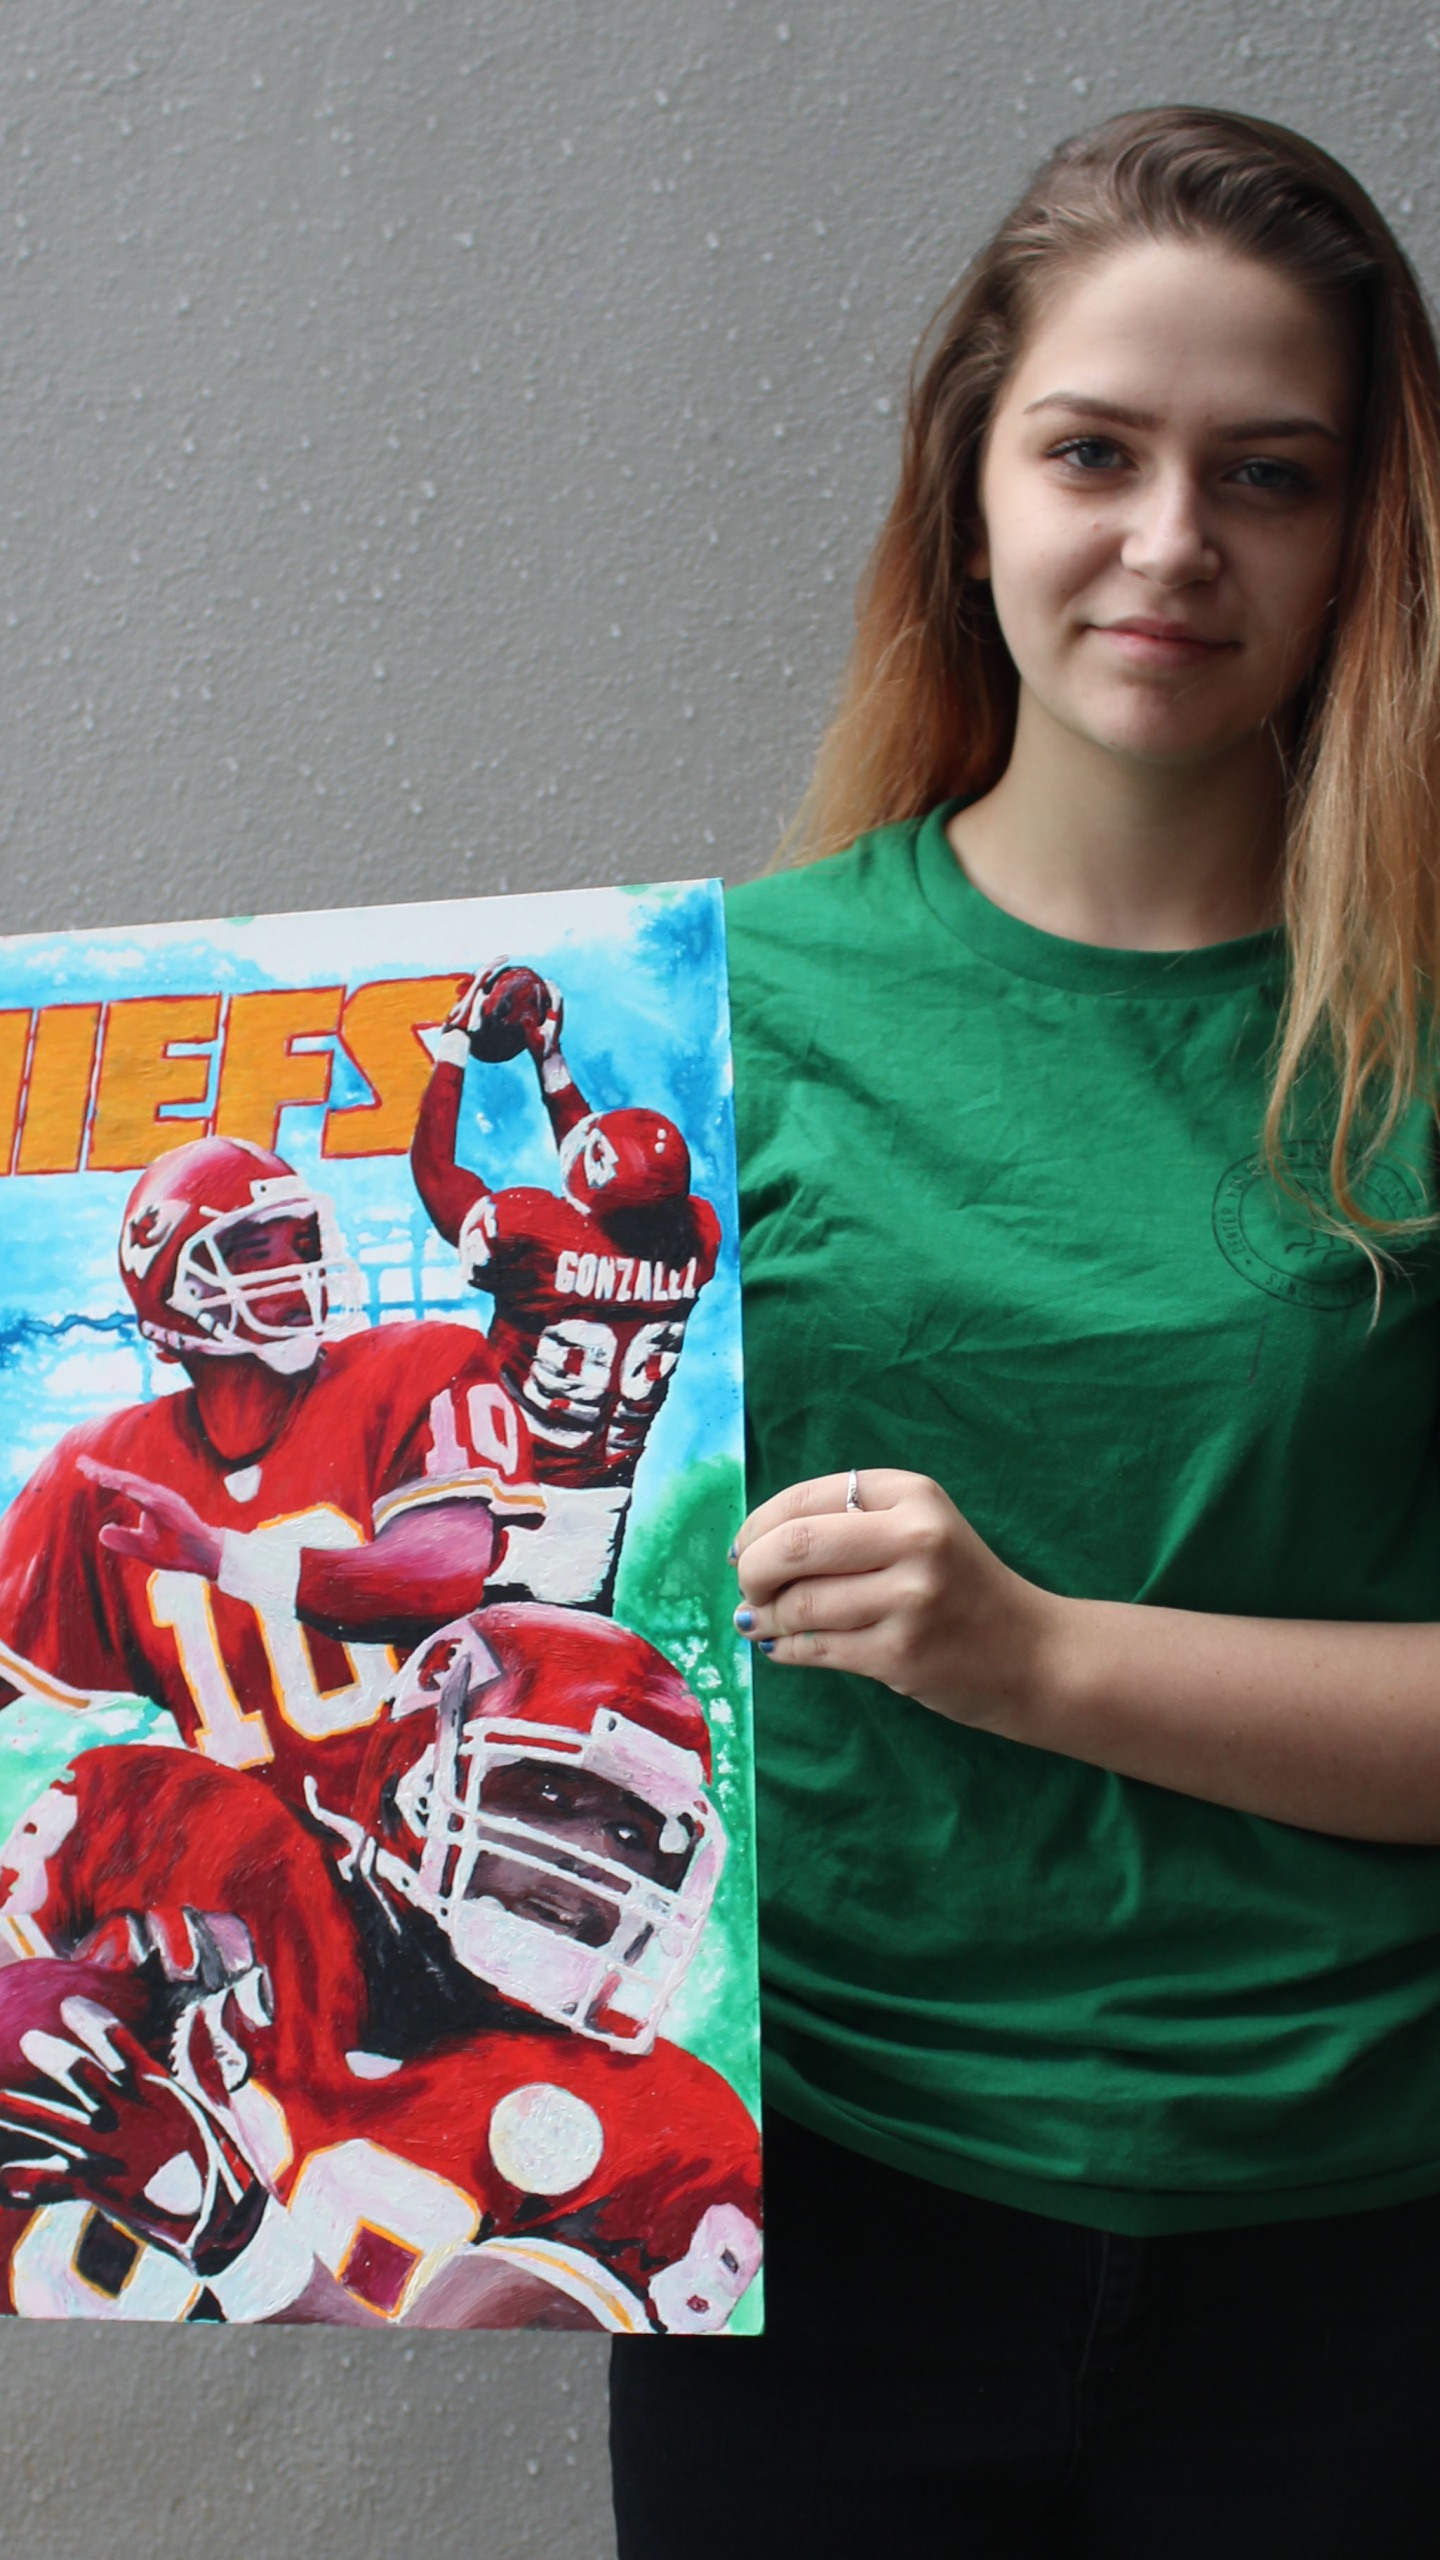 Emma Kelley also provided a piece for the Kansas City Chiefs football team_1548874661868.jpg.jpg